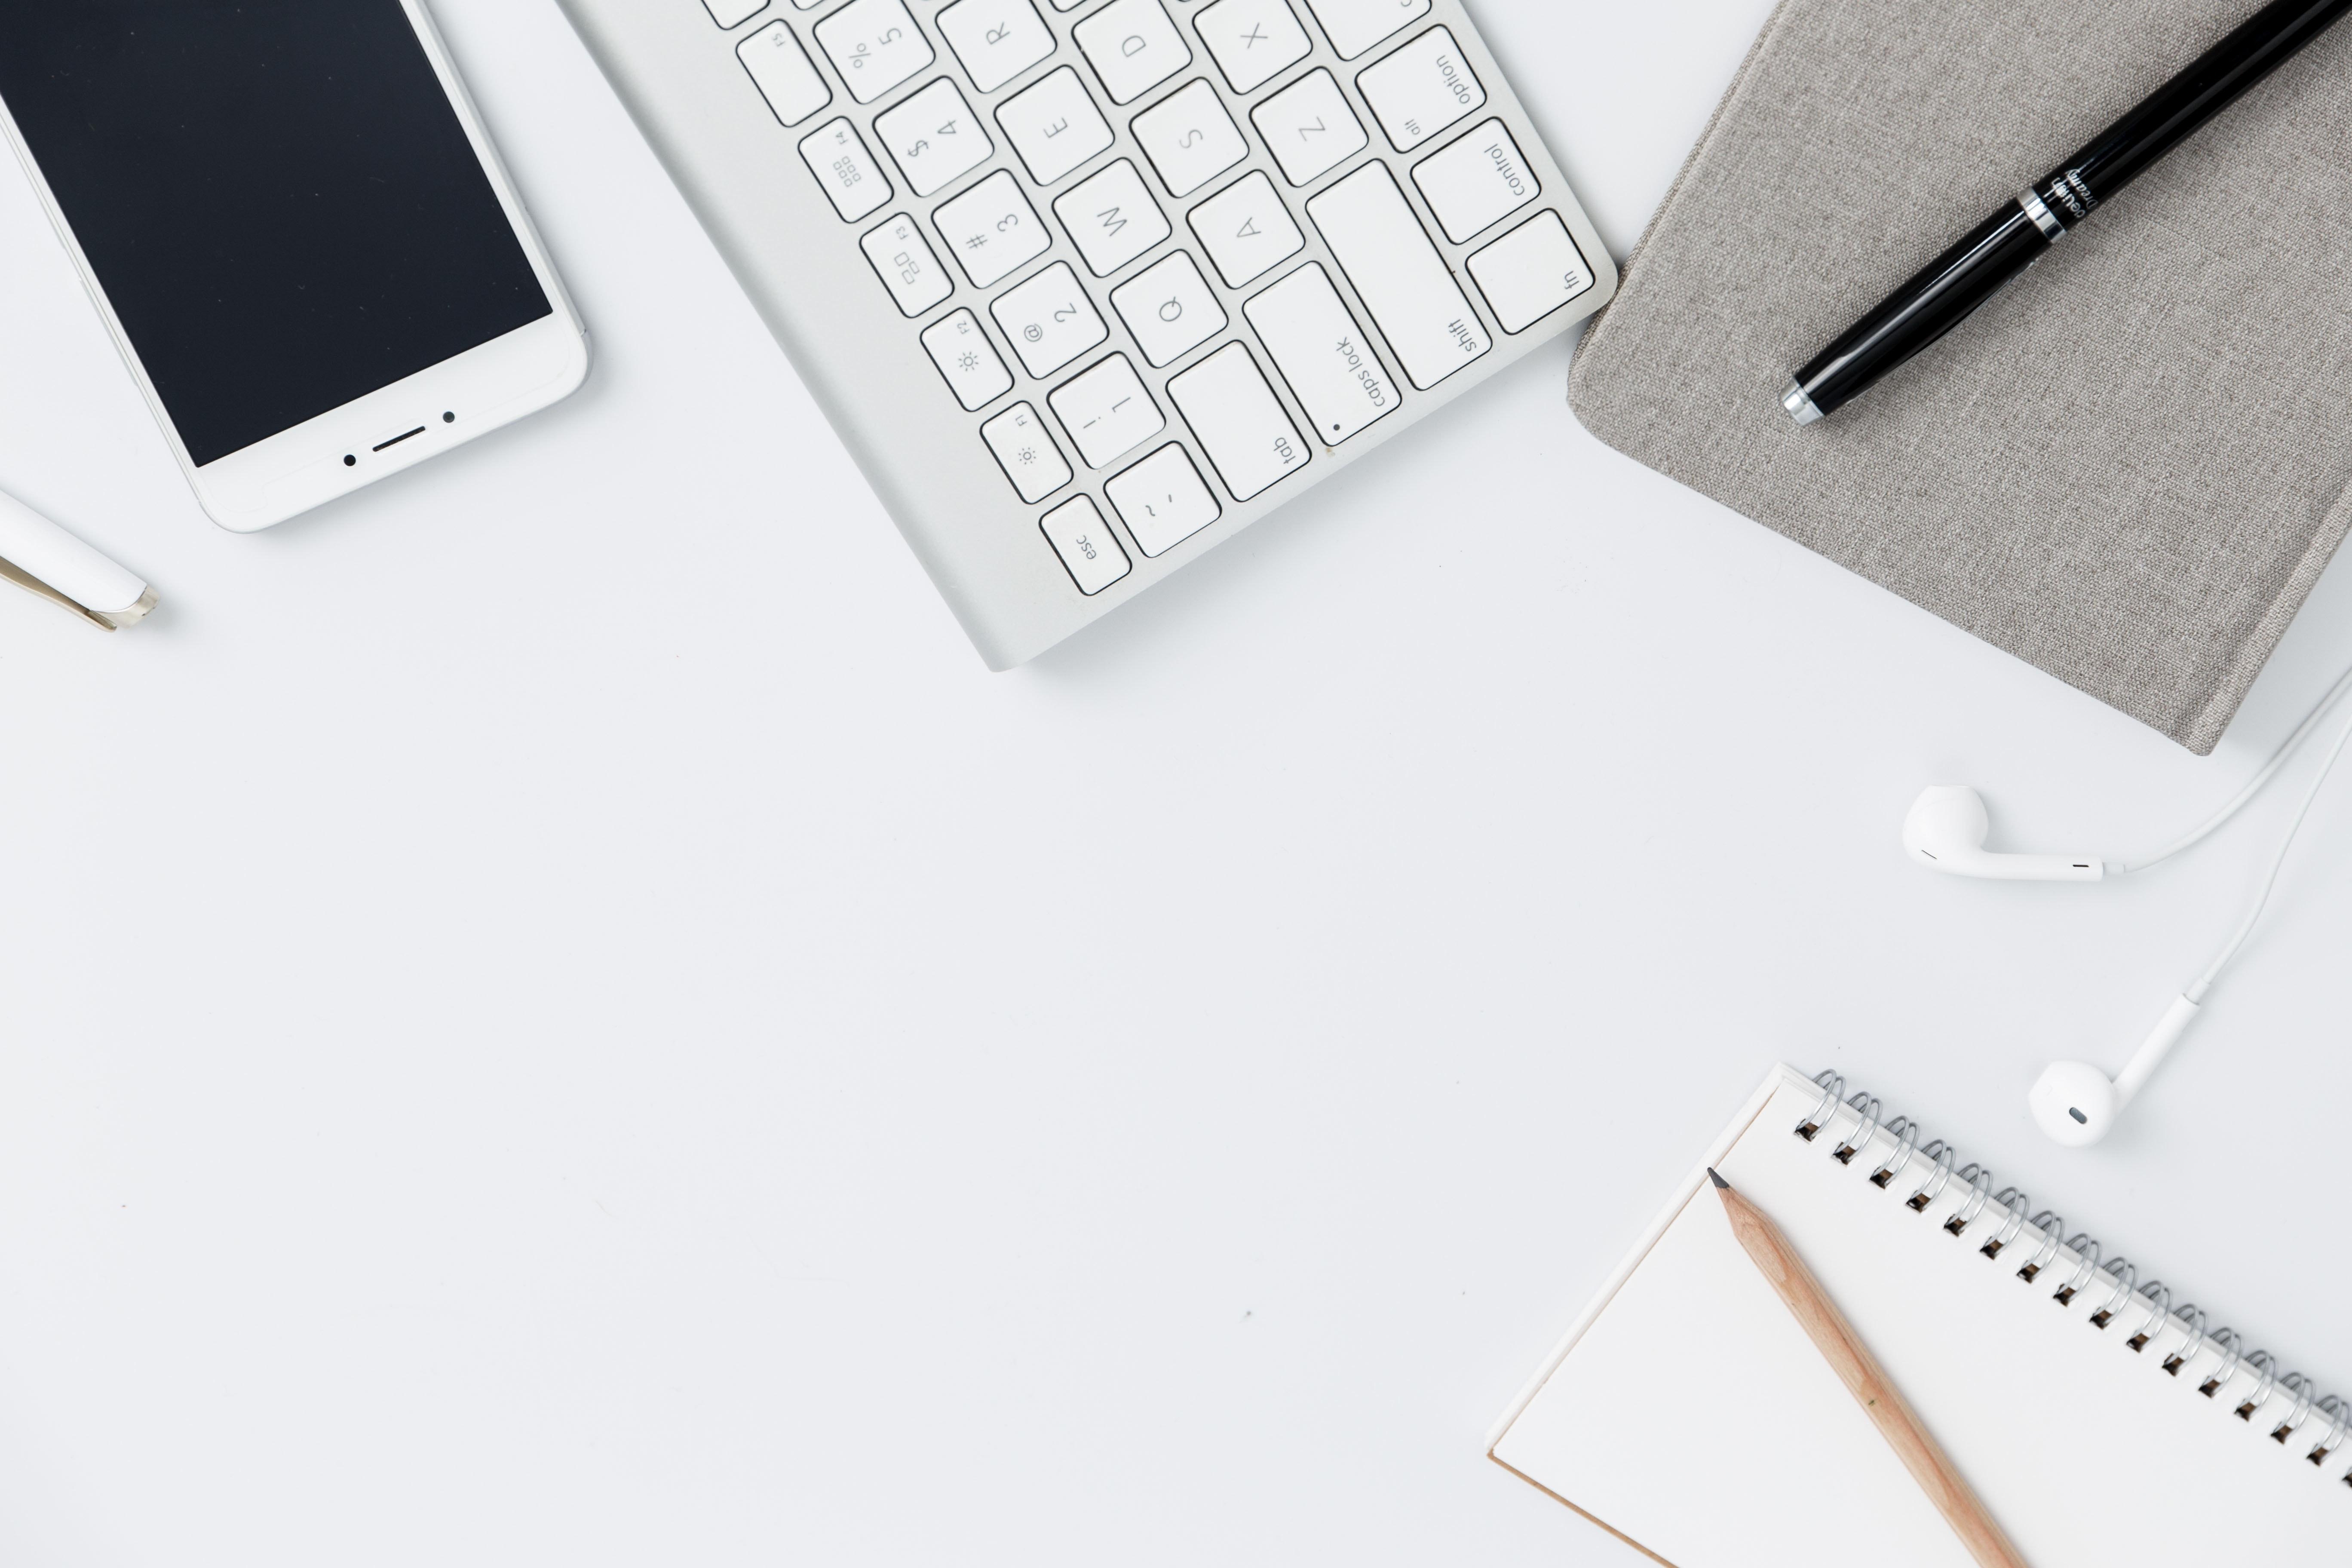 slider-backround-white-earphones-work-place-look